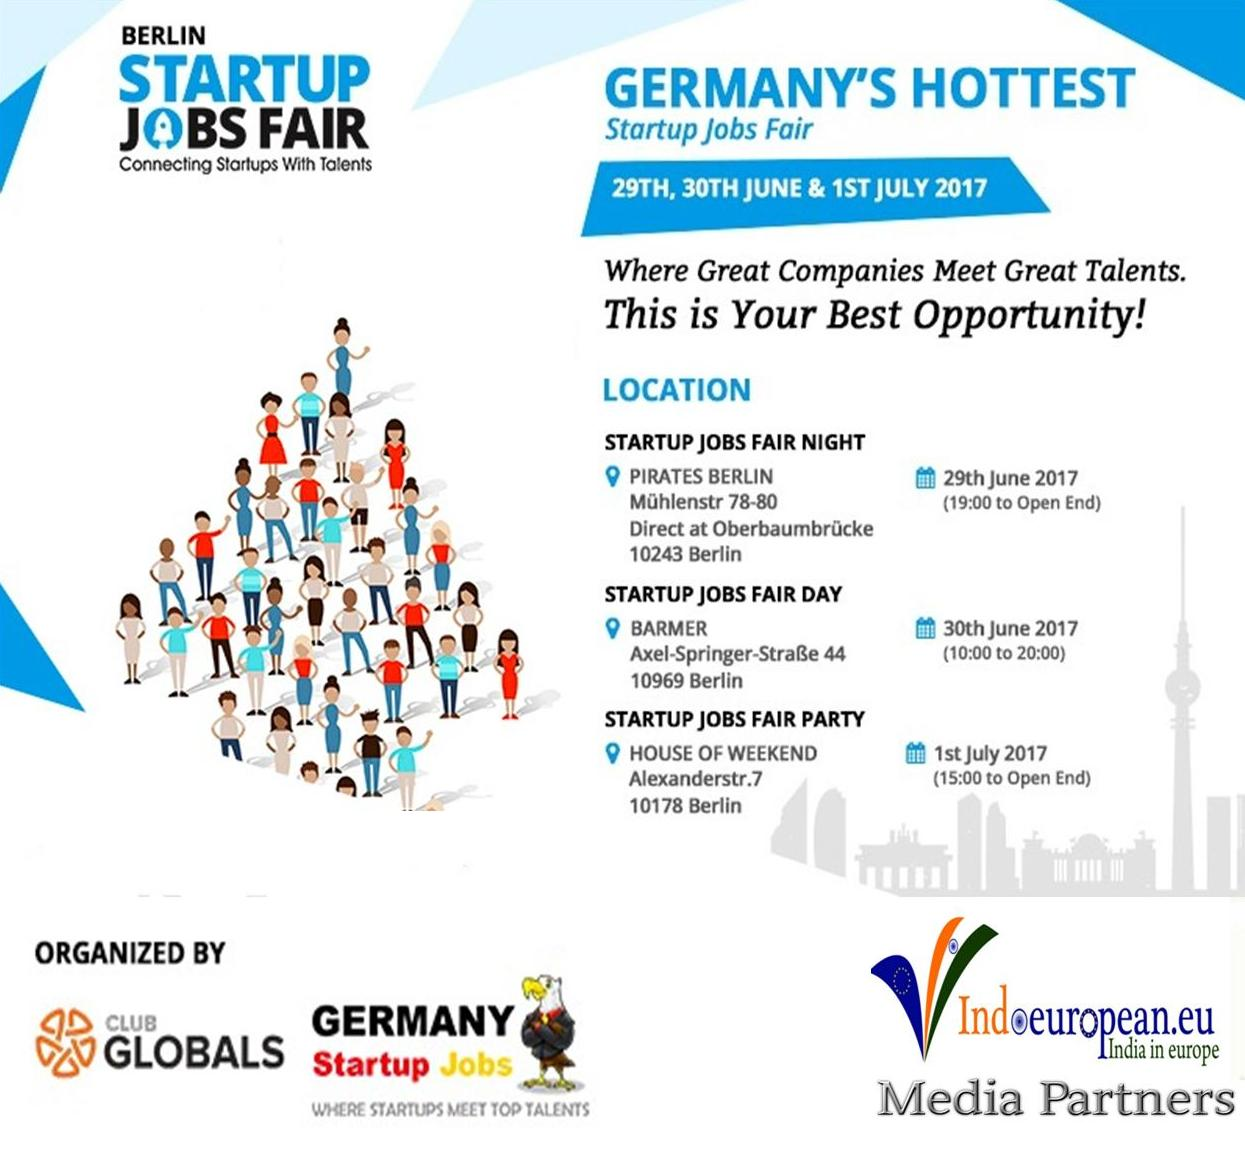 Germanys hottest startup job fair   Indoeuropean.eu